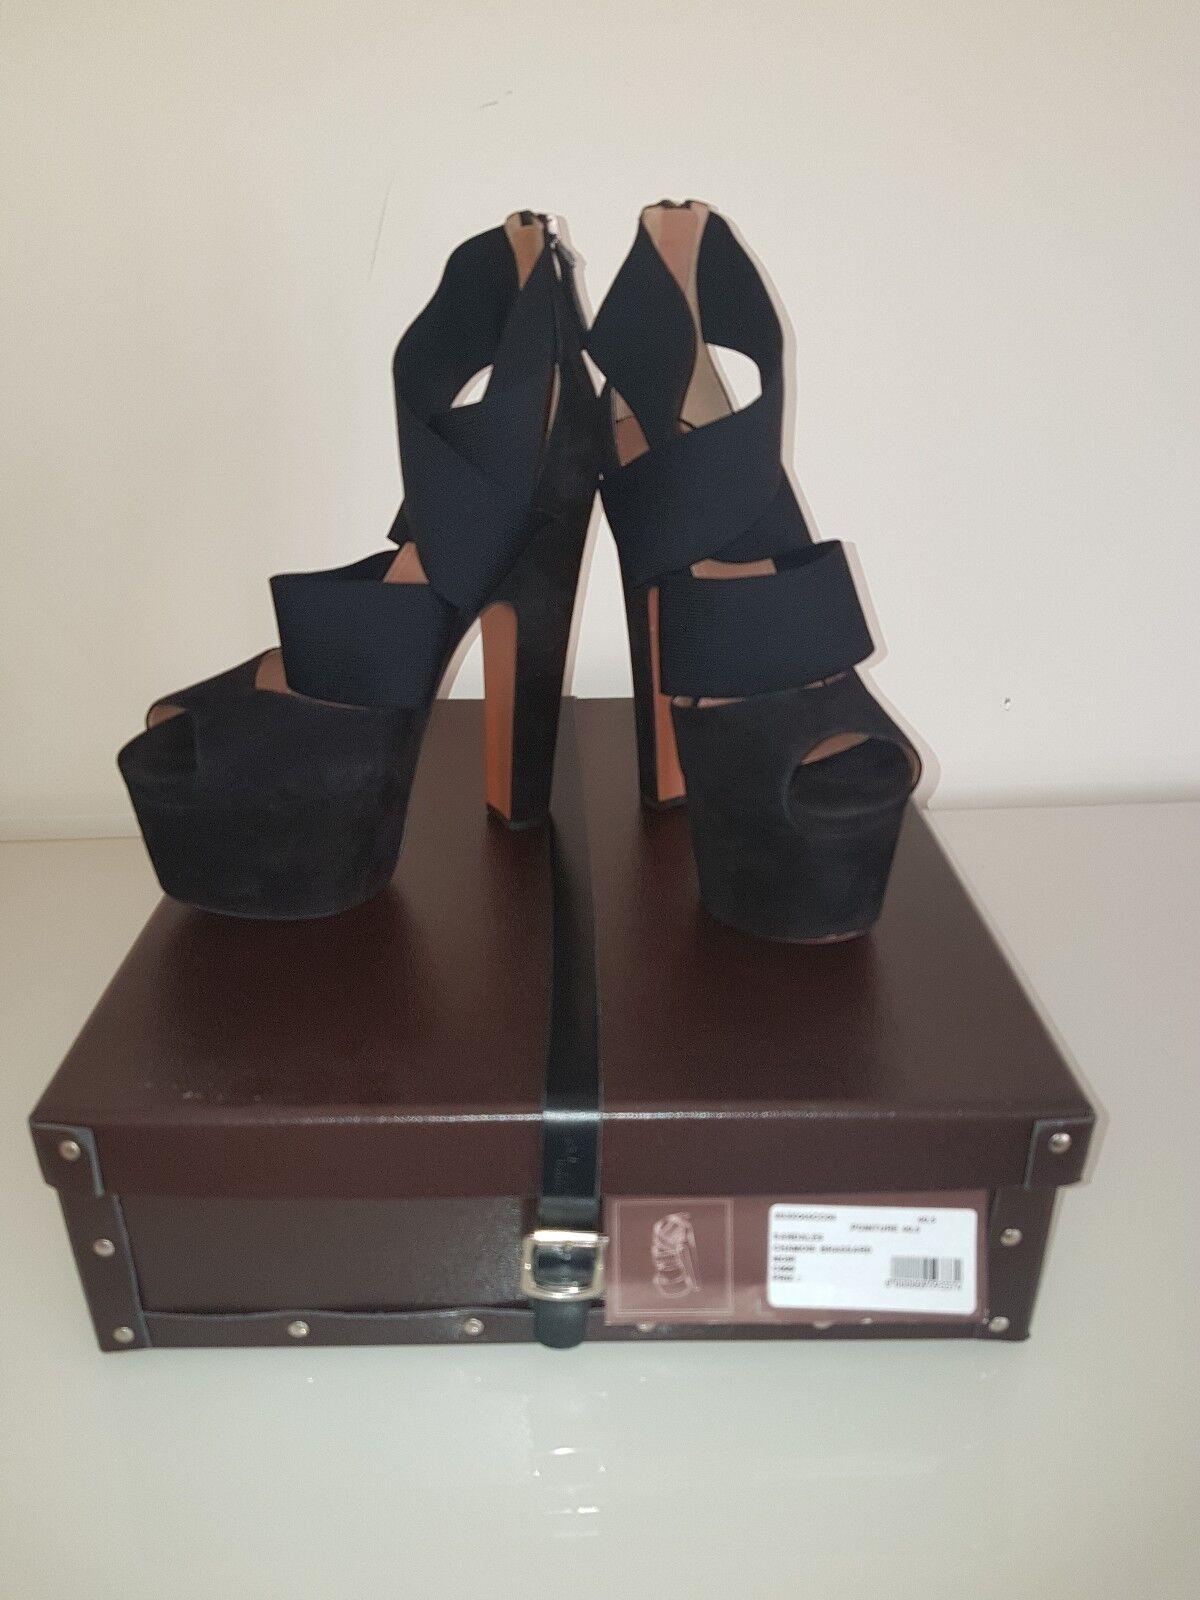 Azzedine Alaïa Black Suede Suede Suede Platform Heels Sandal Size 7,5 UK New 8f629d